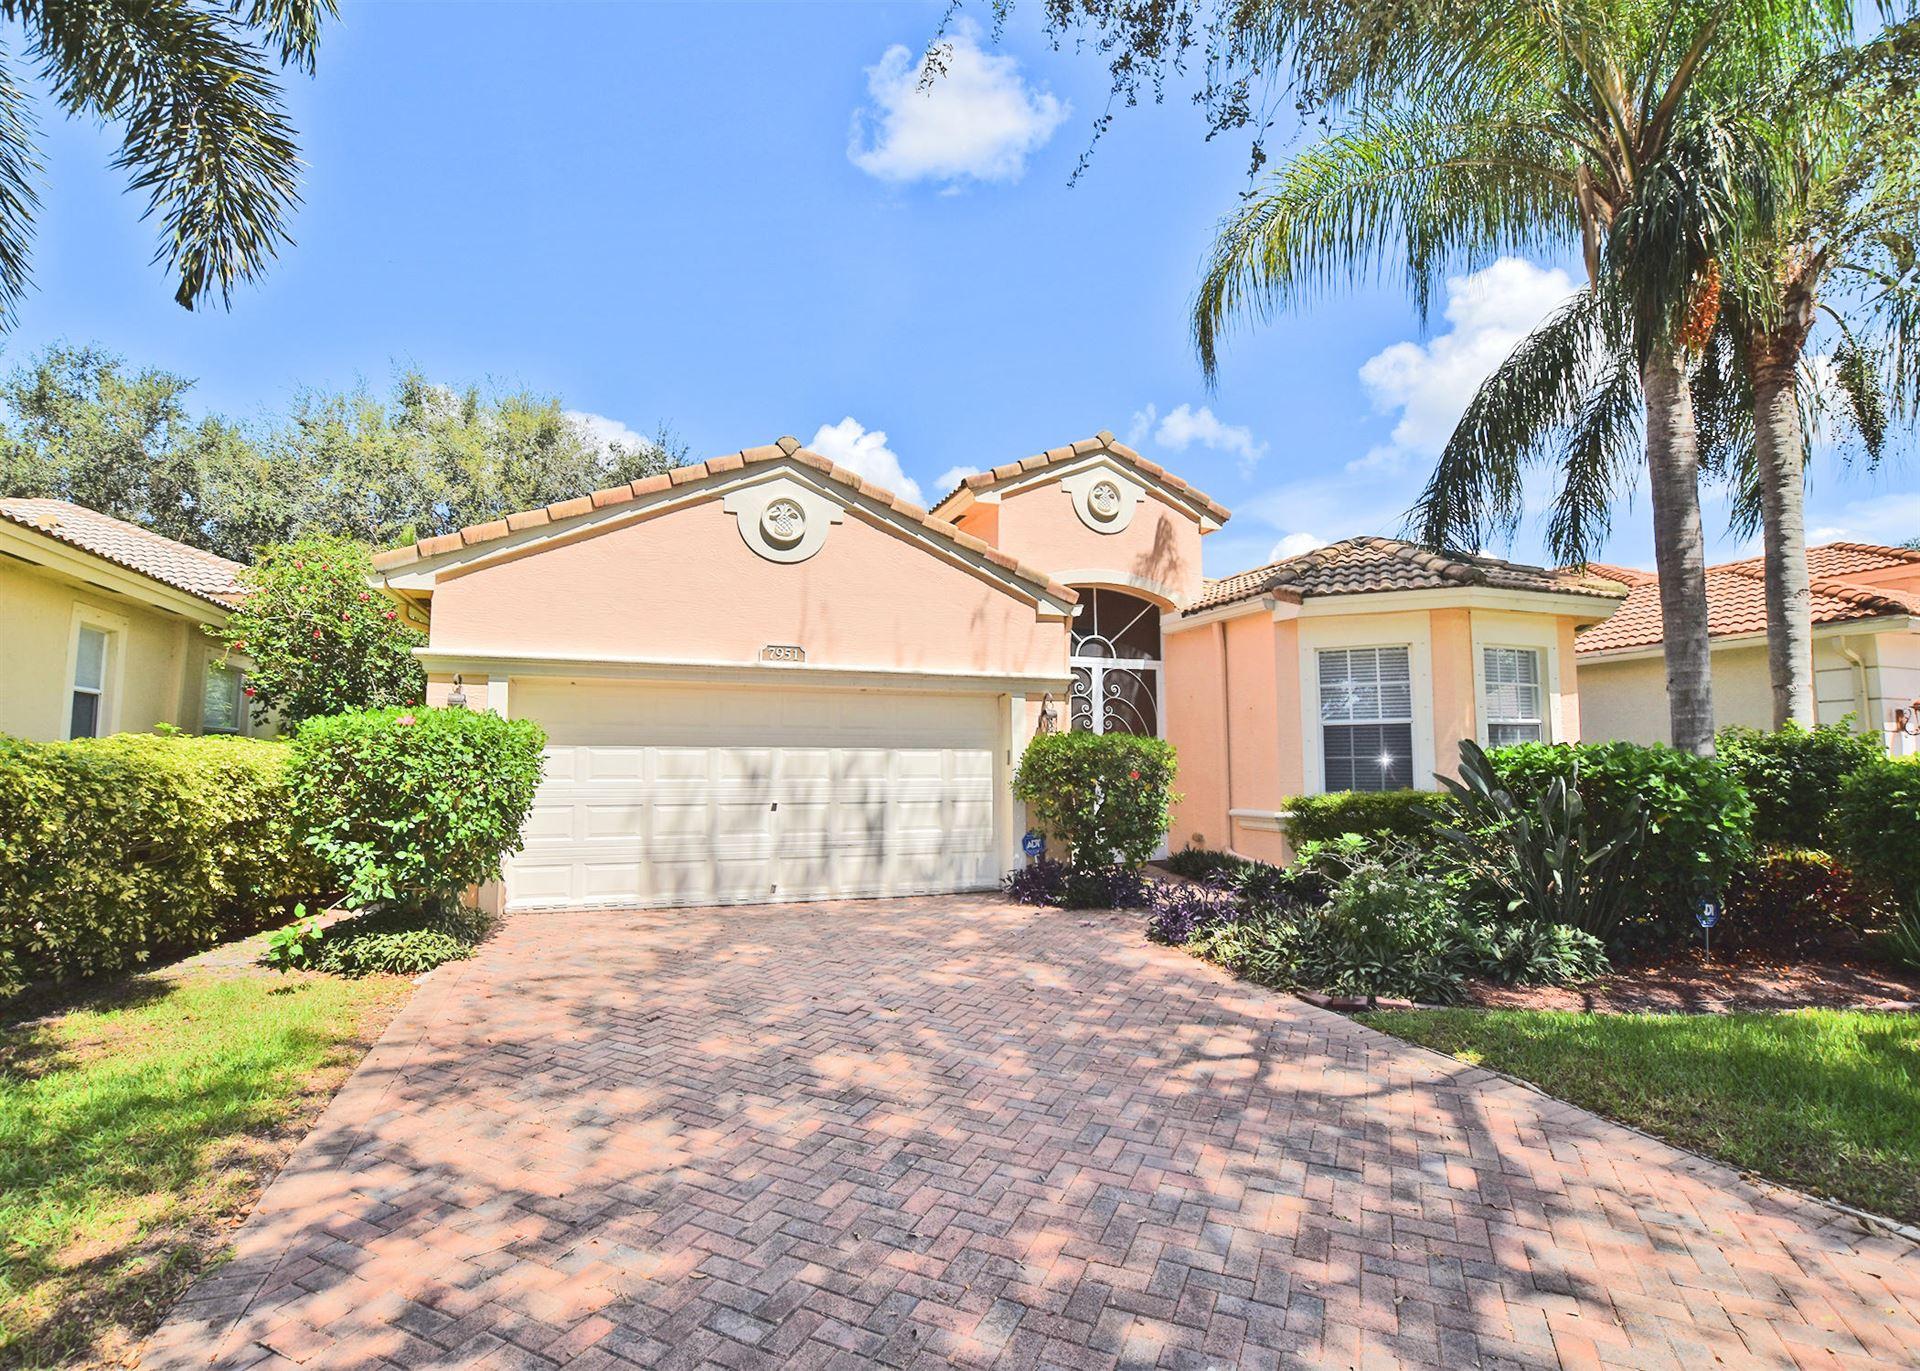 Photo of 7951 New Holland Way, Boynton Beach, FL 33437 (MLS # RX-10656697)